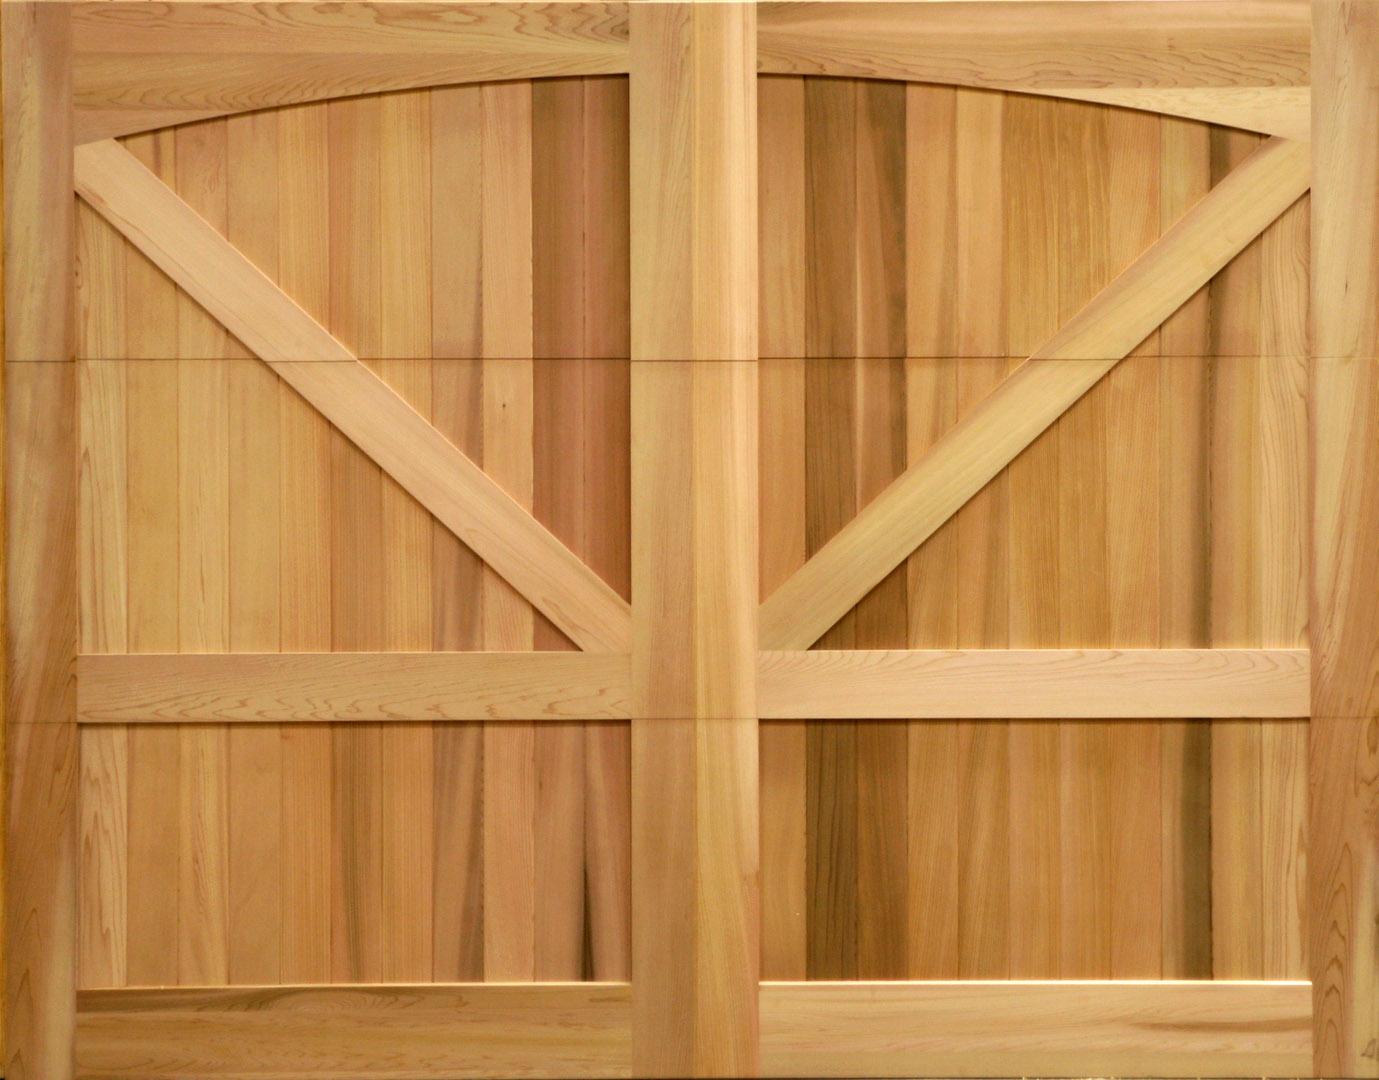 Custom Stain Grade Wood Garage Door In Clear Western Red